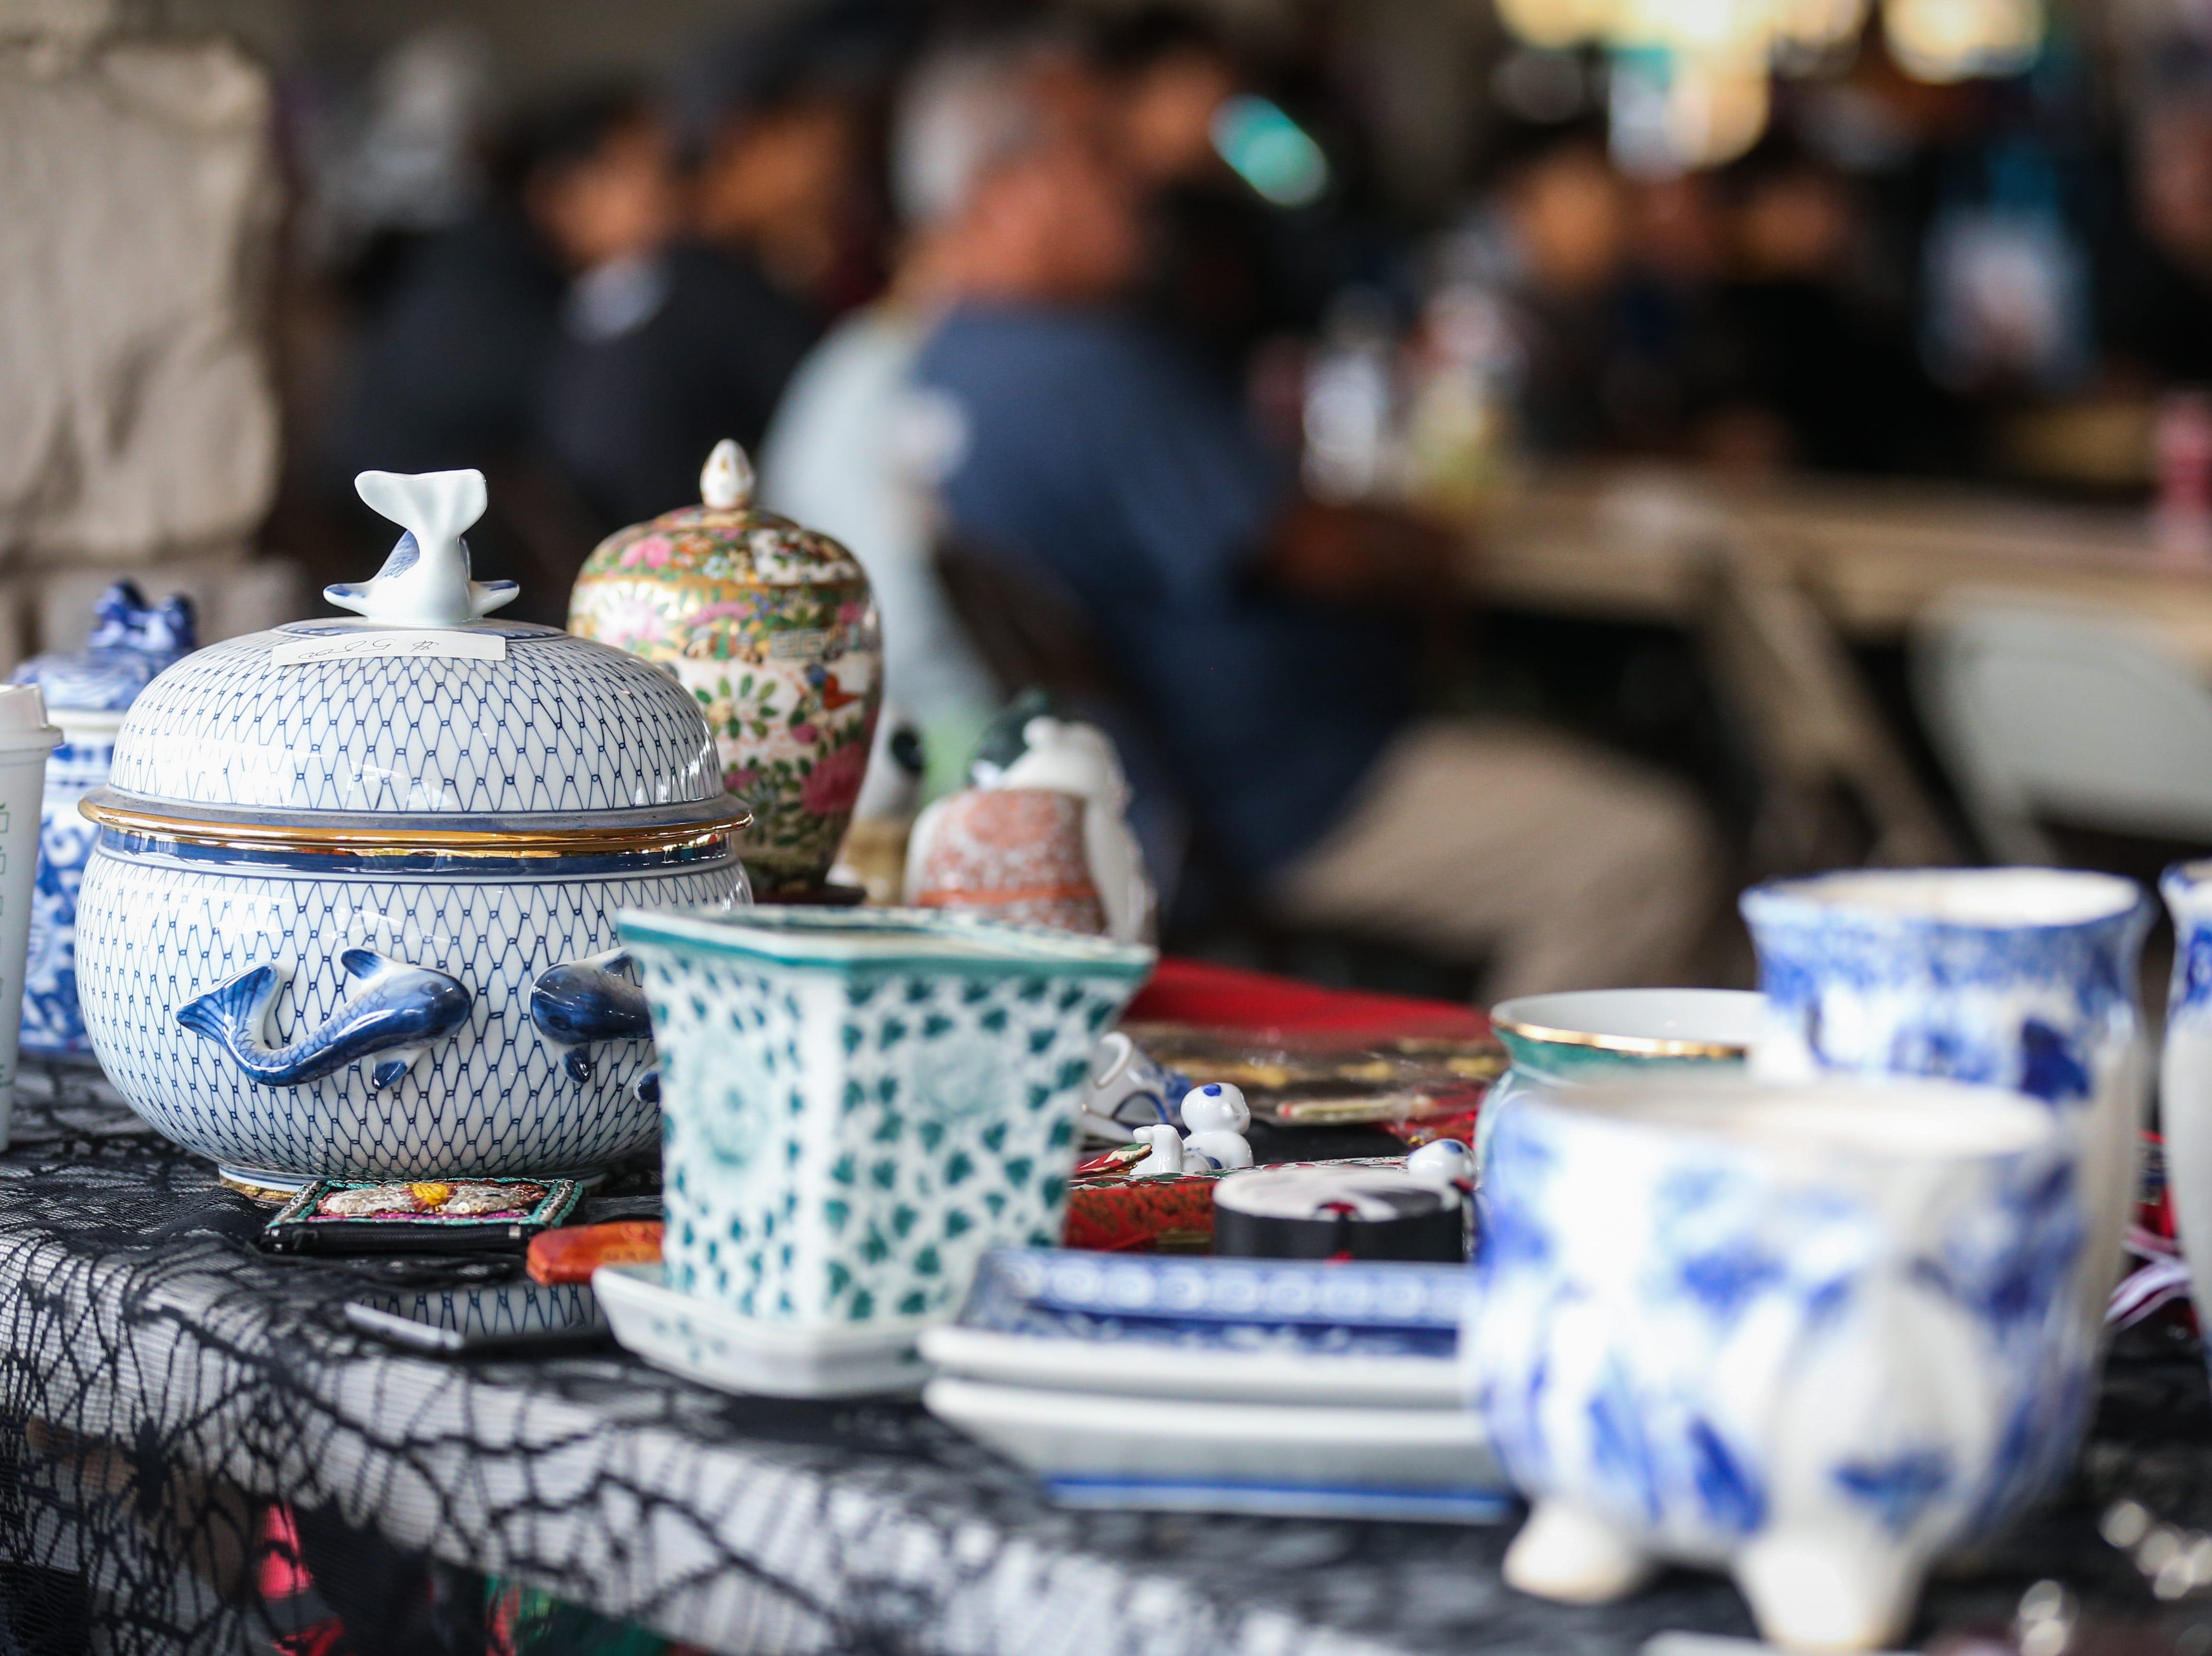 Vases in display at a booth during the Asian Bazaar Saturday, Oct. 20, 2018, at El Paseo de Santa Angela.